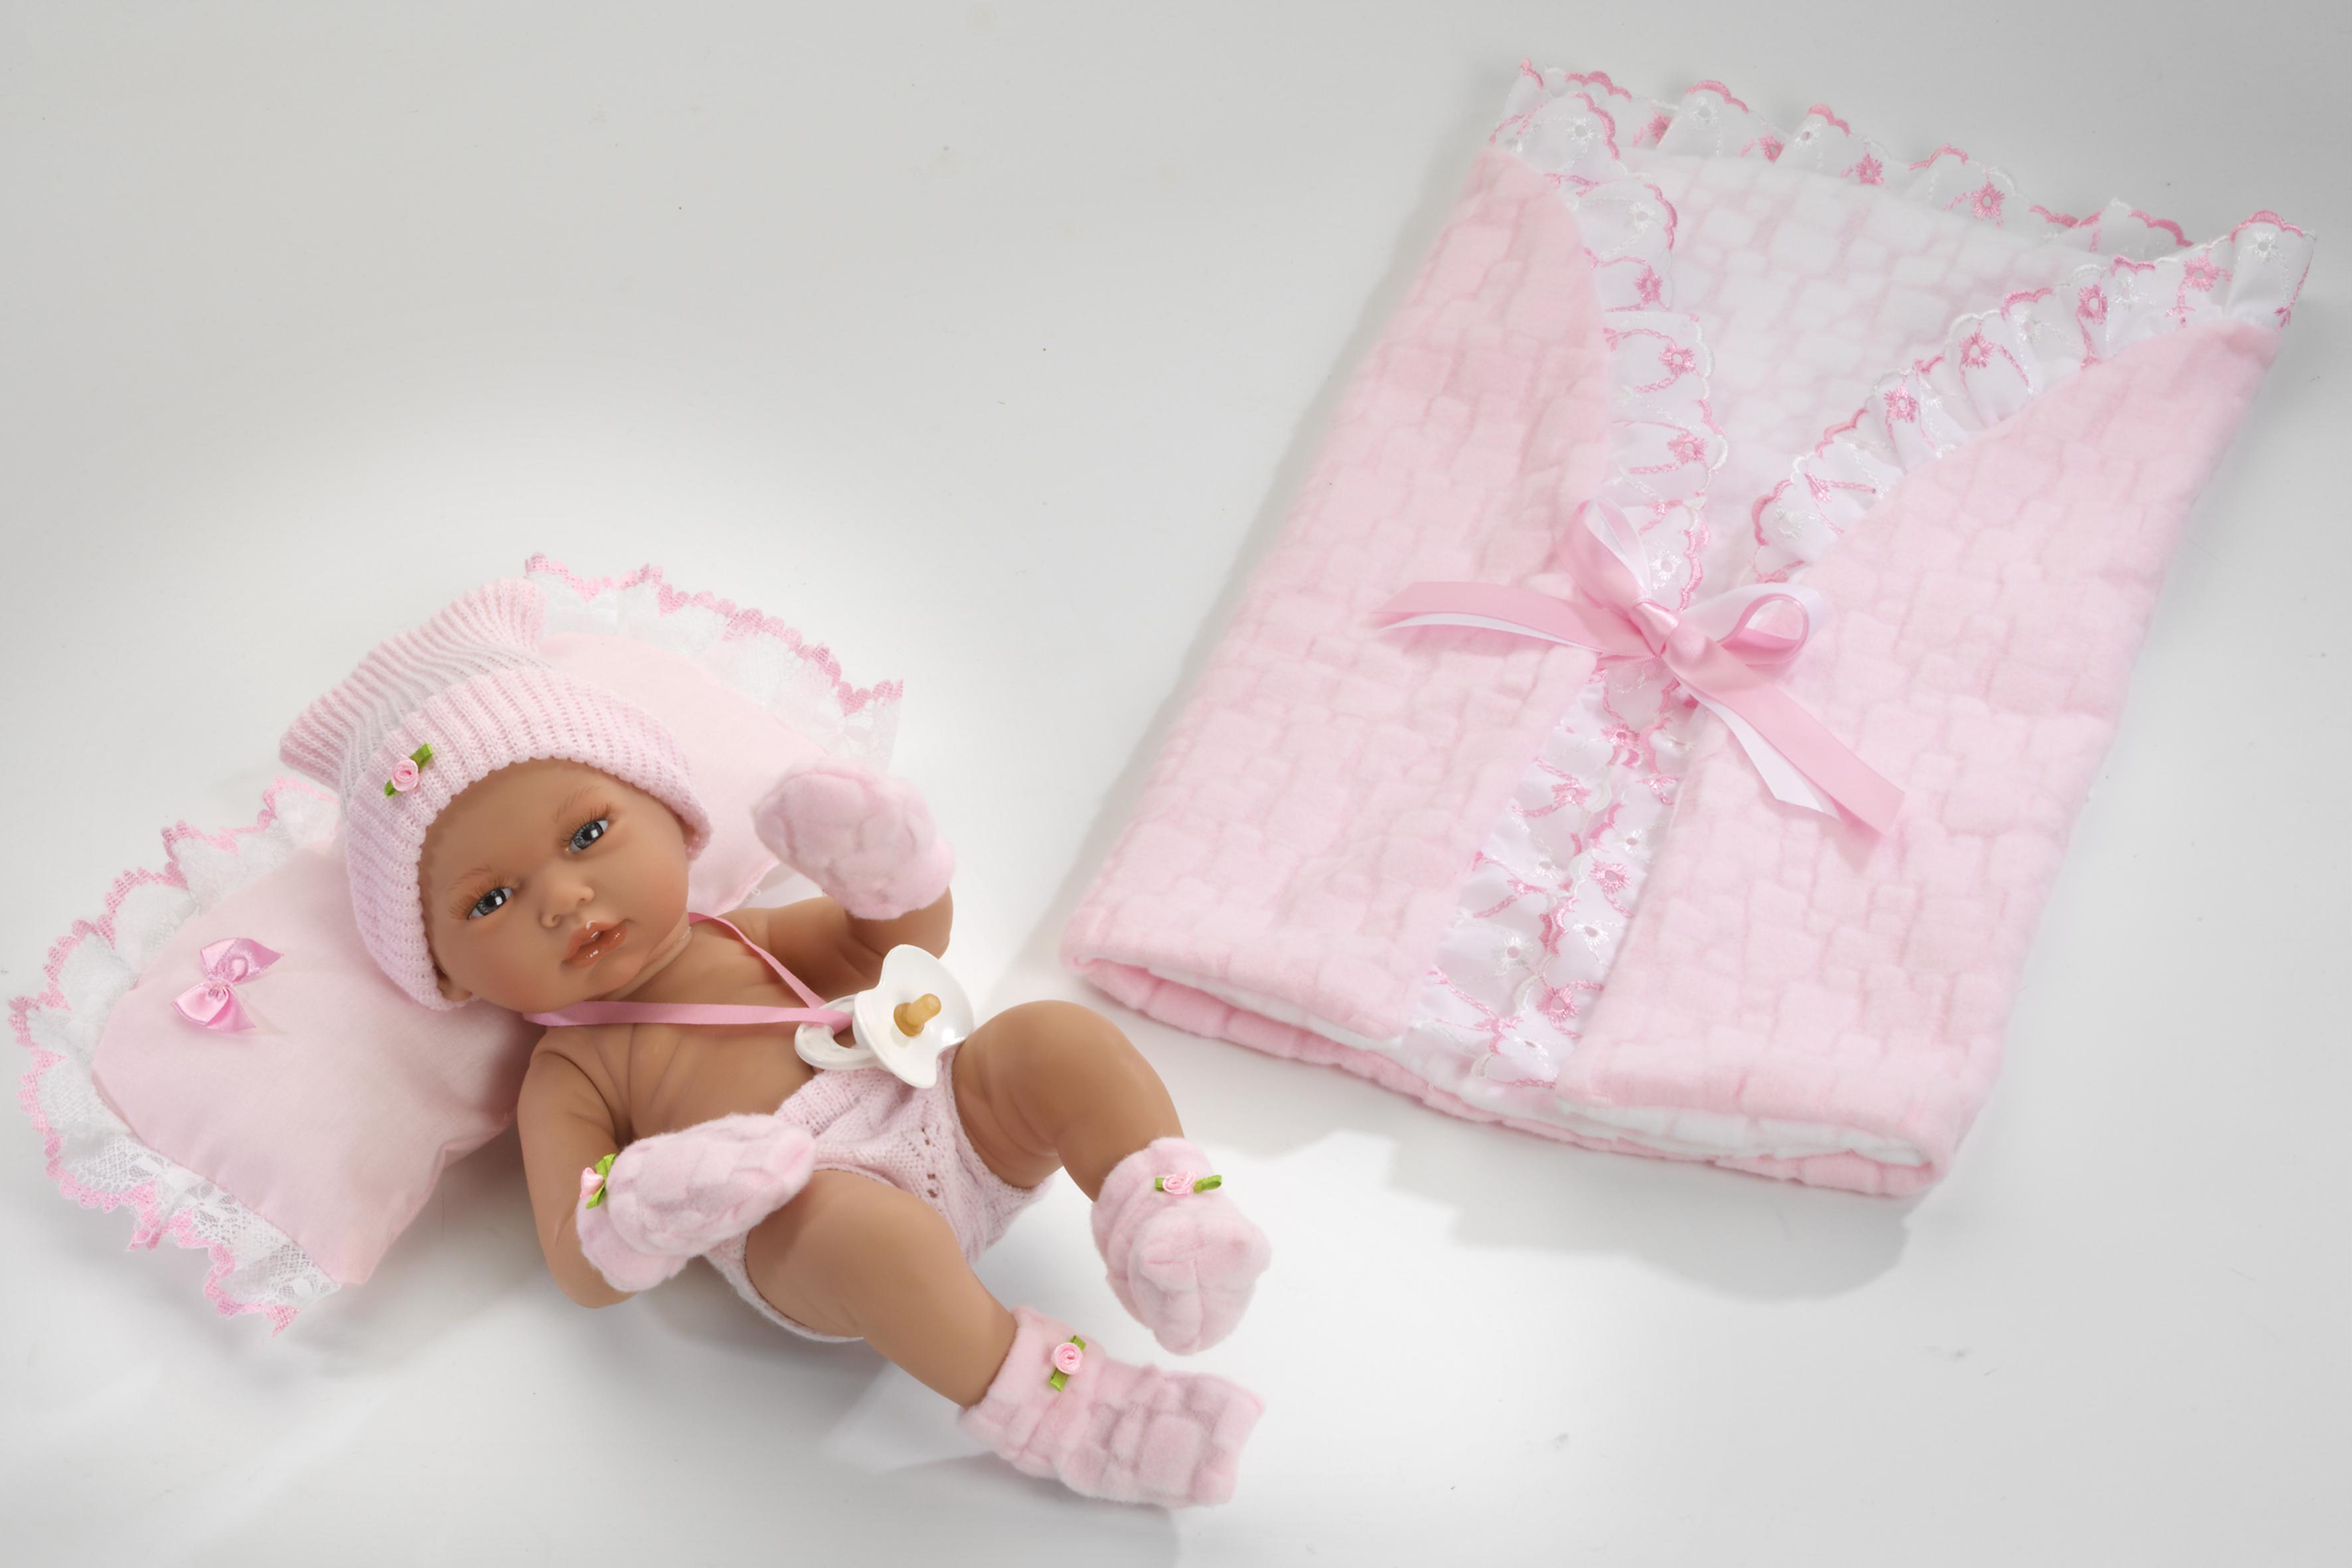 Realistické miminko - holčička Anetka od firmy Guca ze Španělska (Doprava zdarma)